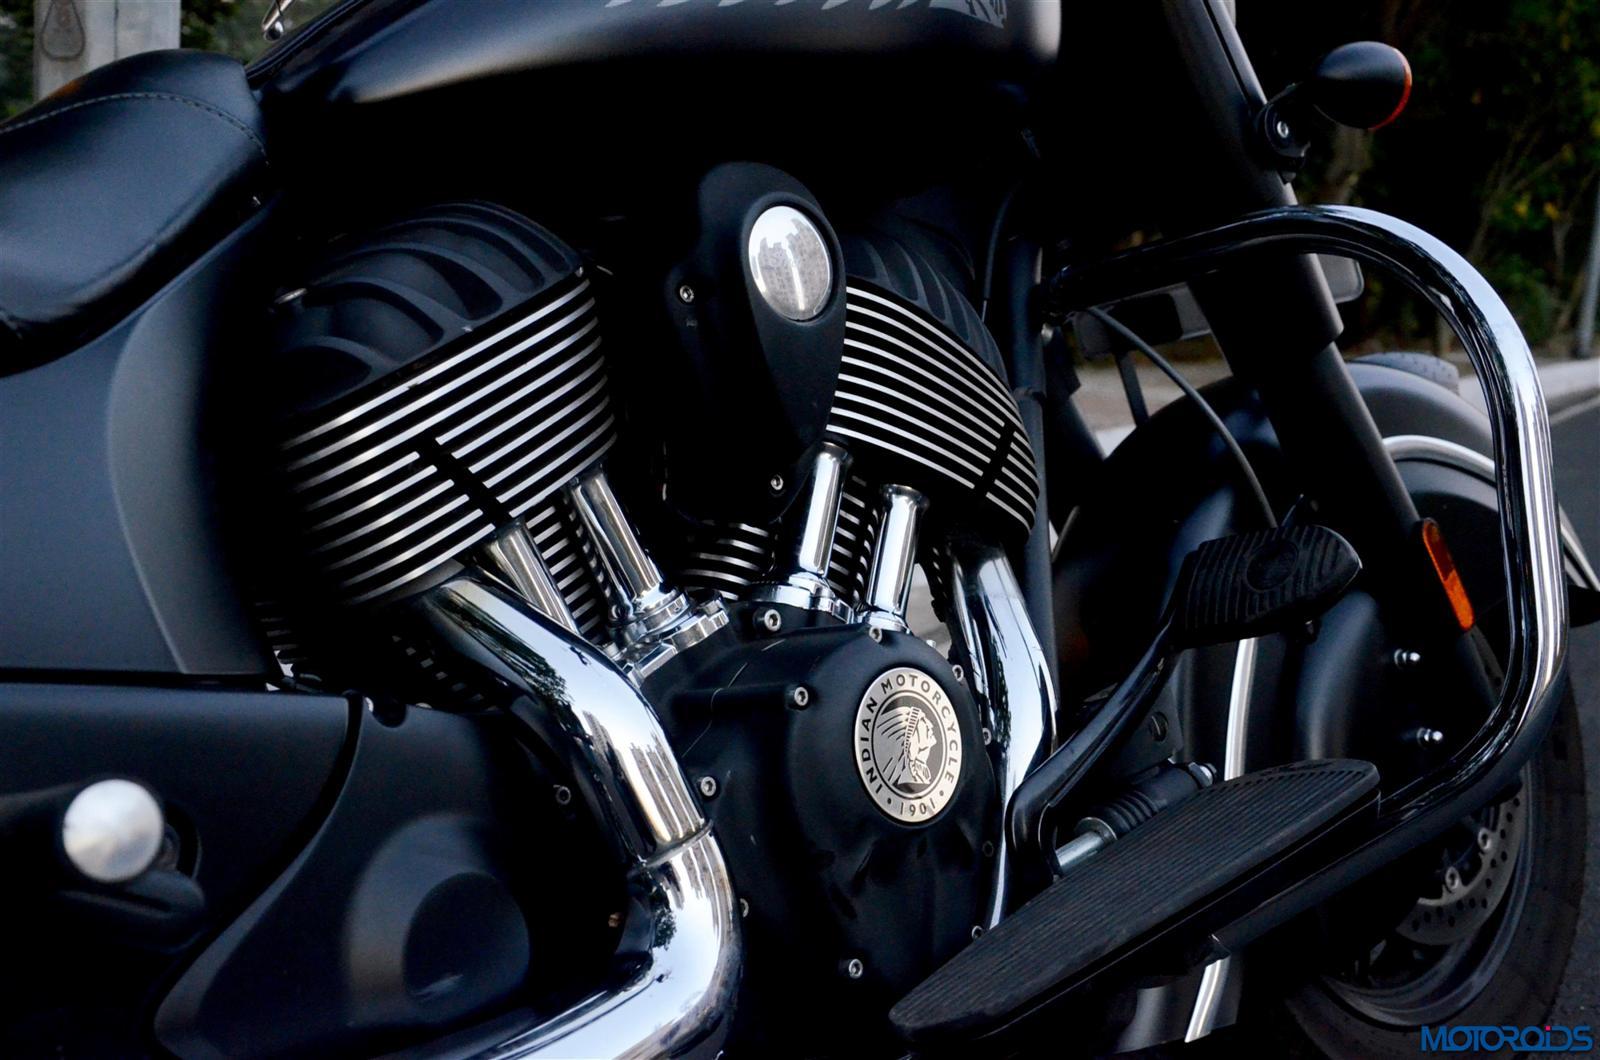 Indian Dark Horse twin cylinders